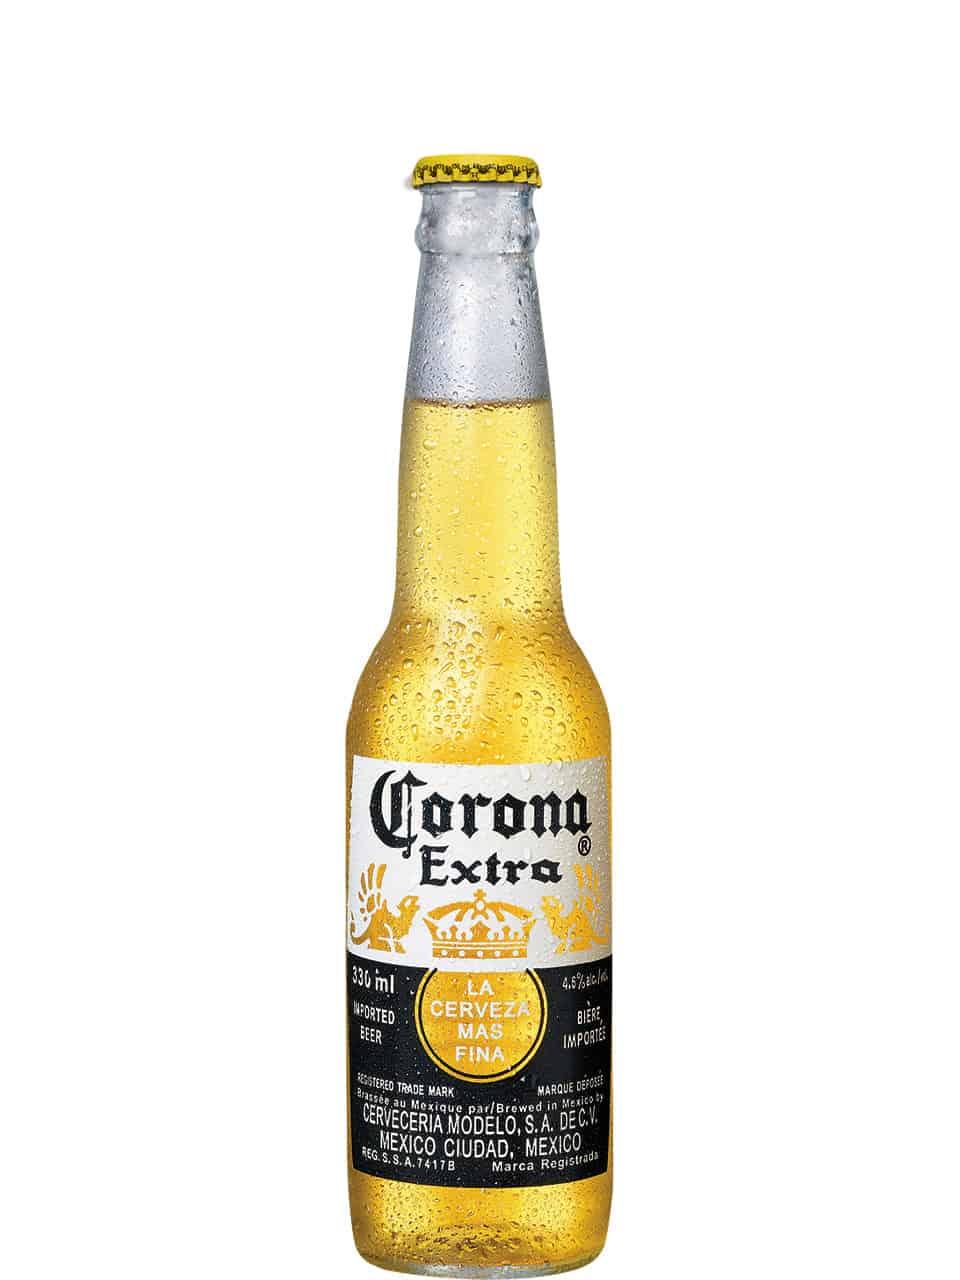 Corona Extra Bottles 12pk